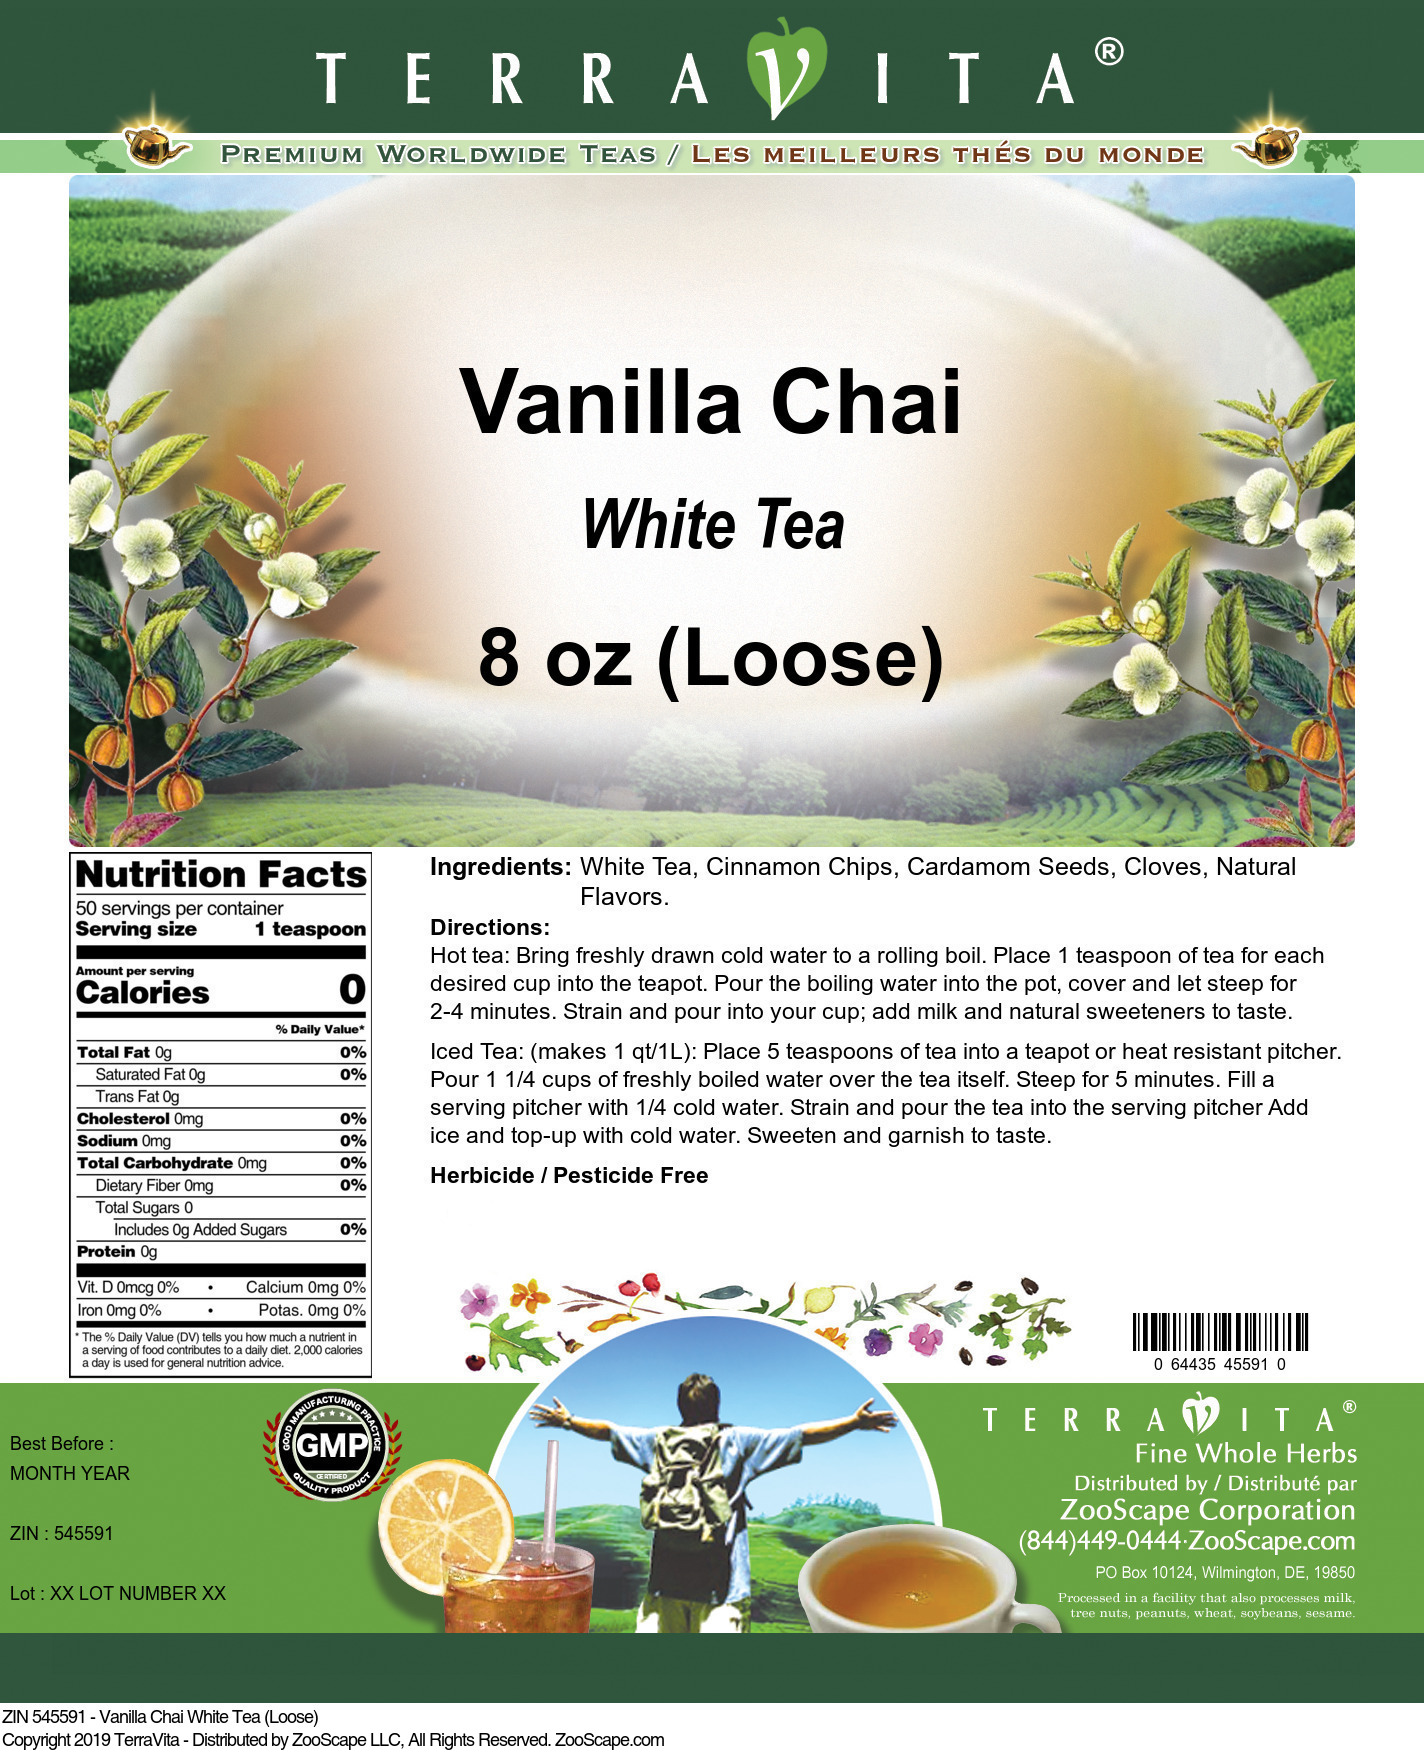 Vanilla Chai White Tea (Loose)